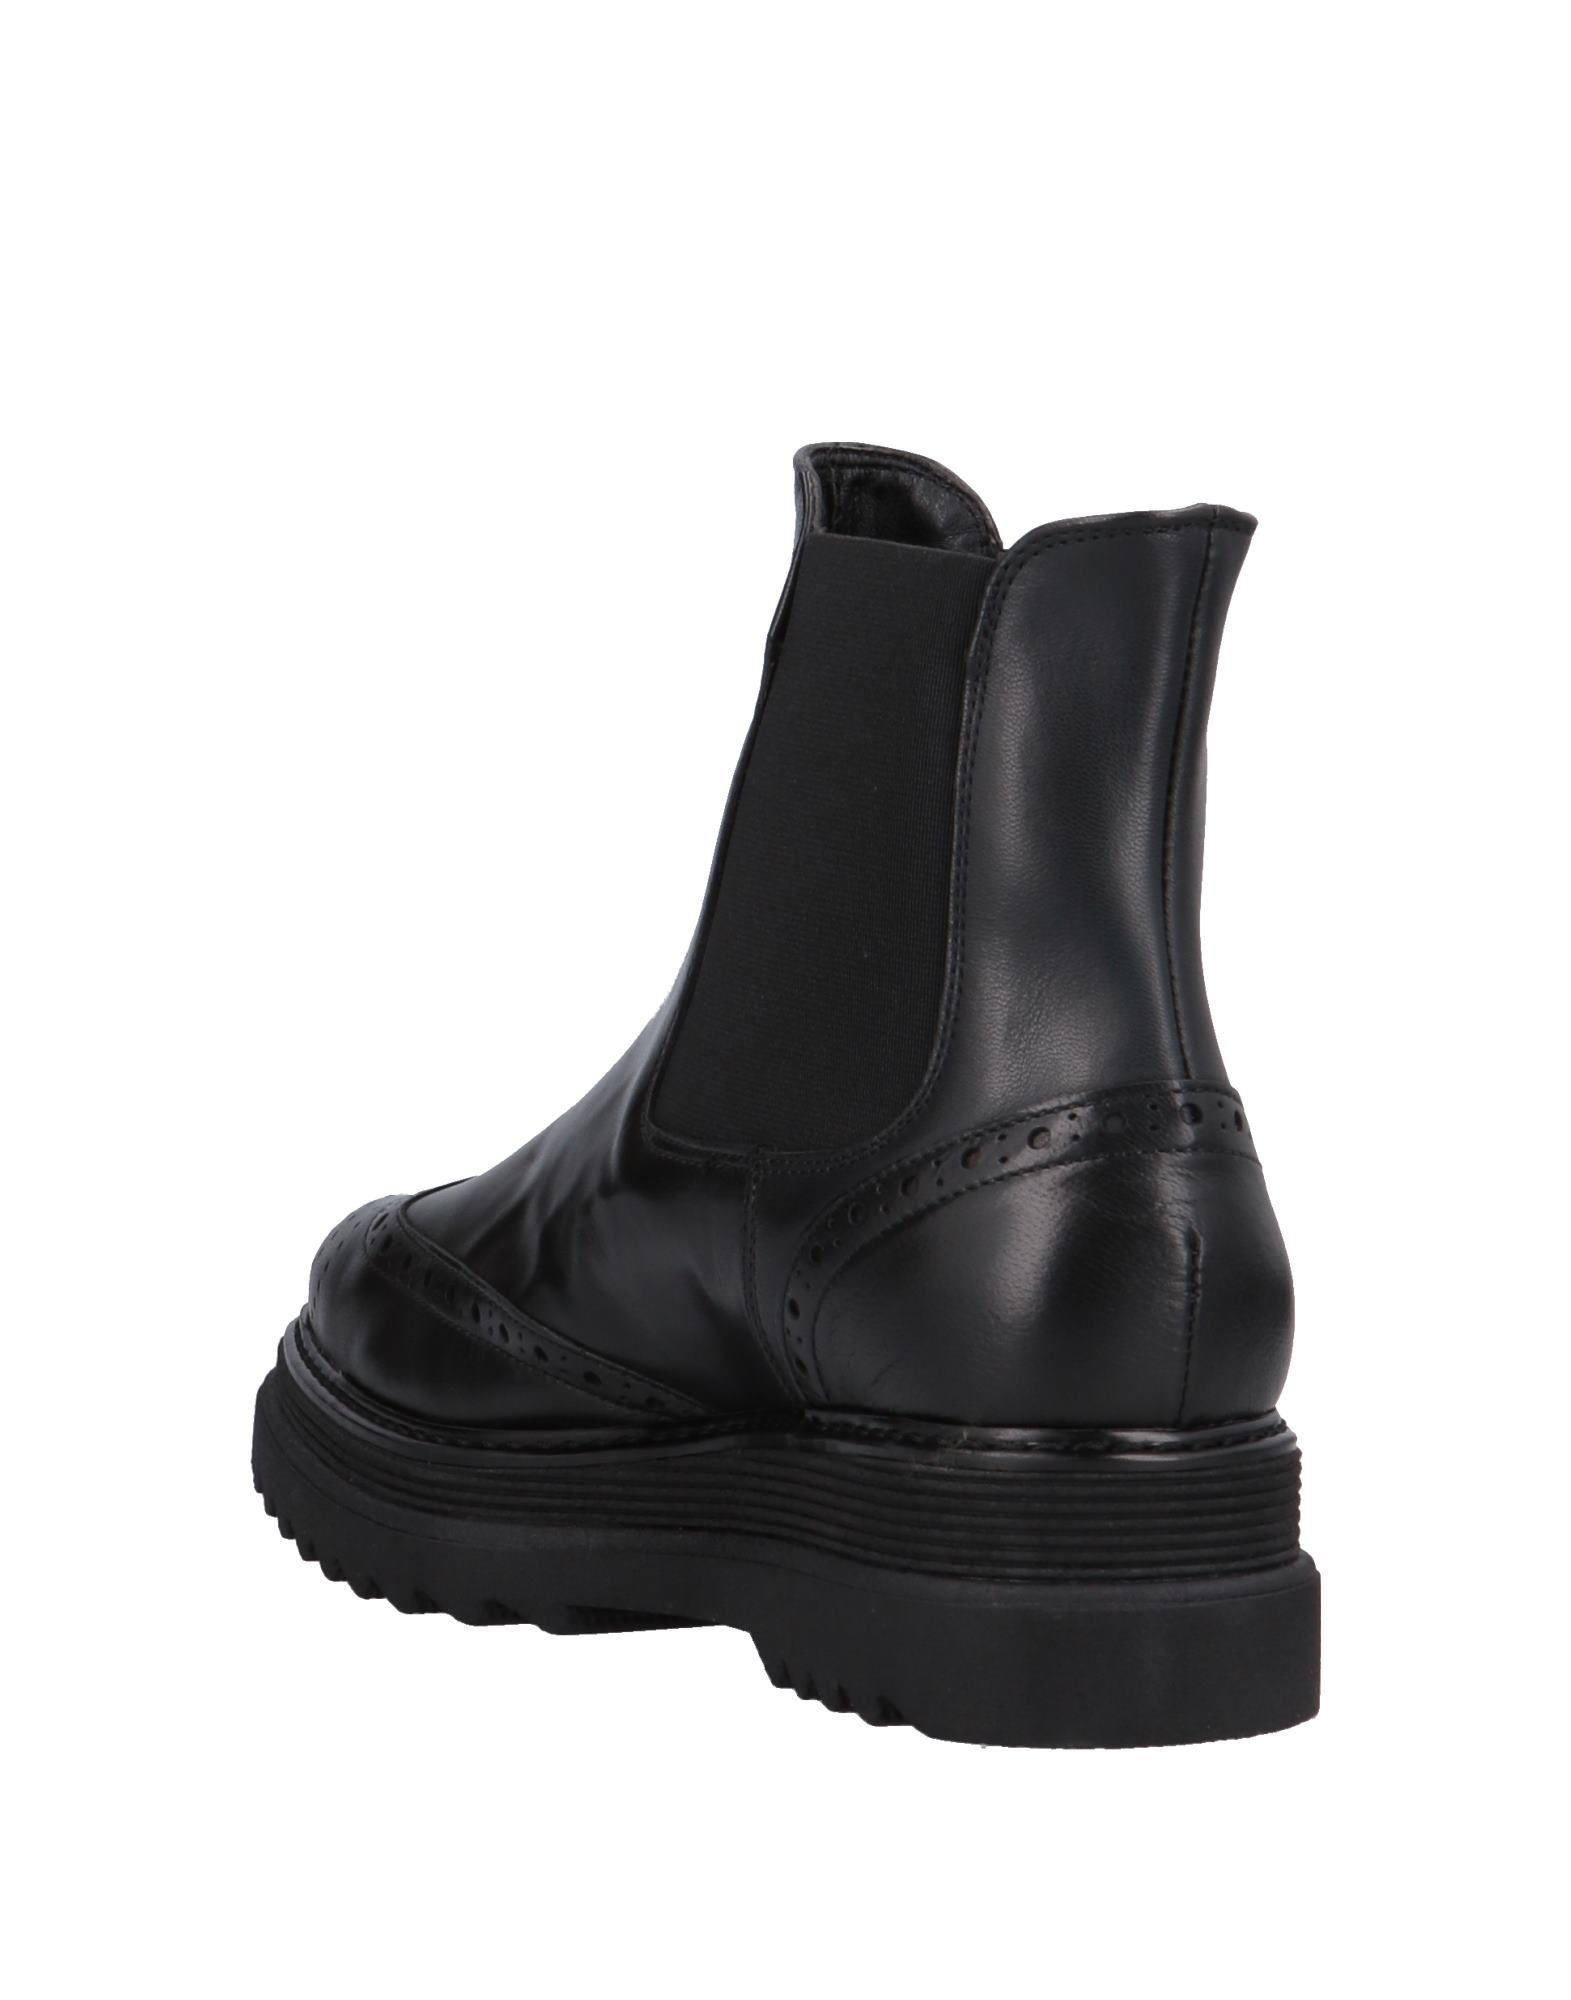 Loretta By Loretta Qualität Chelsea Boots Damen  11546408JU Gute Qualität Loretta beliebte Schuhe 3fd38c